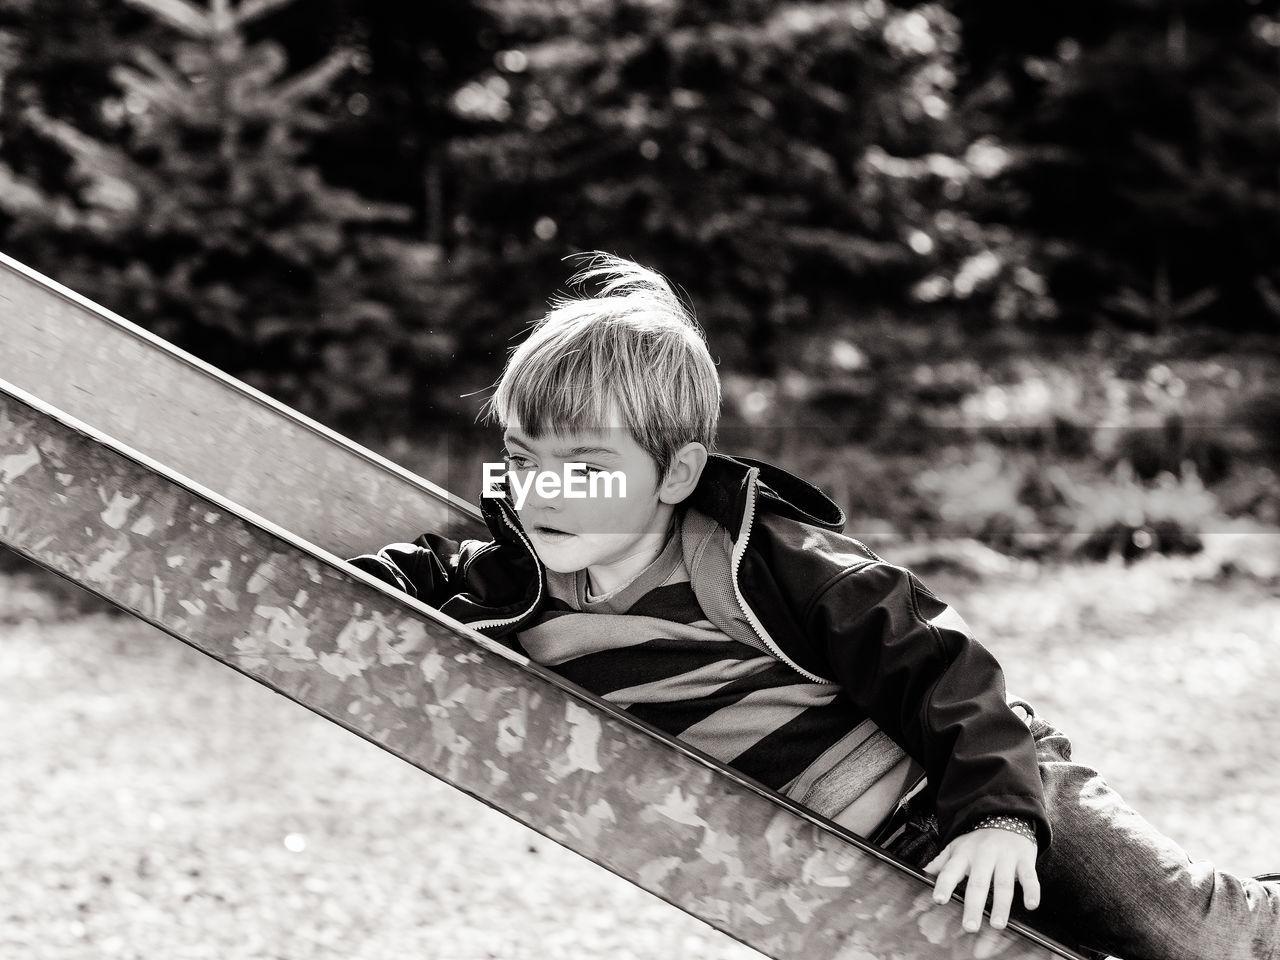 Boy On Slide At Playground